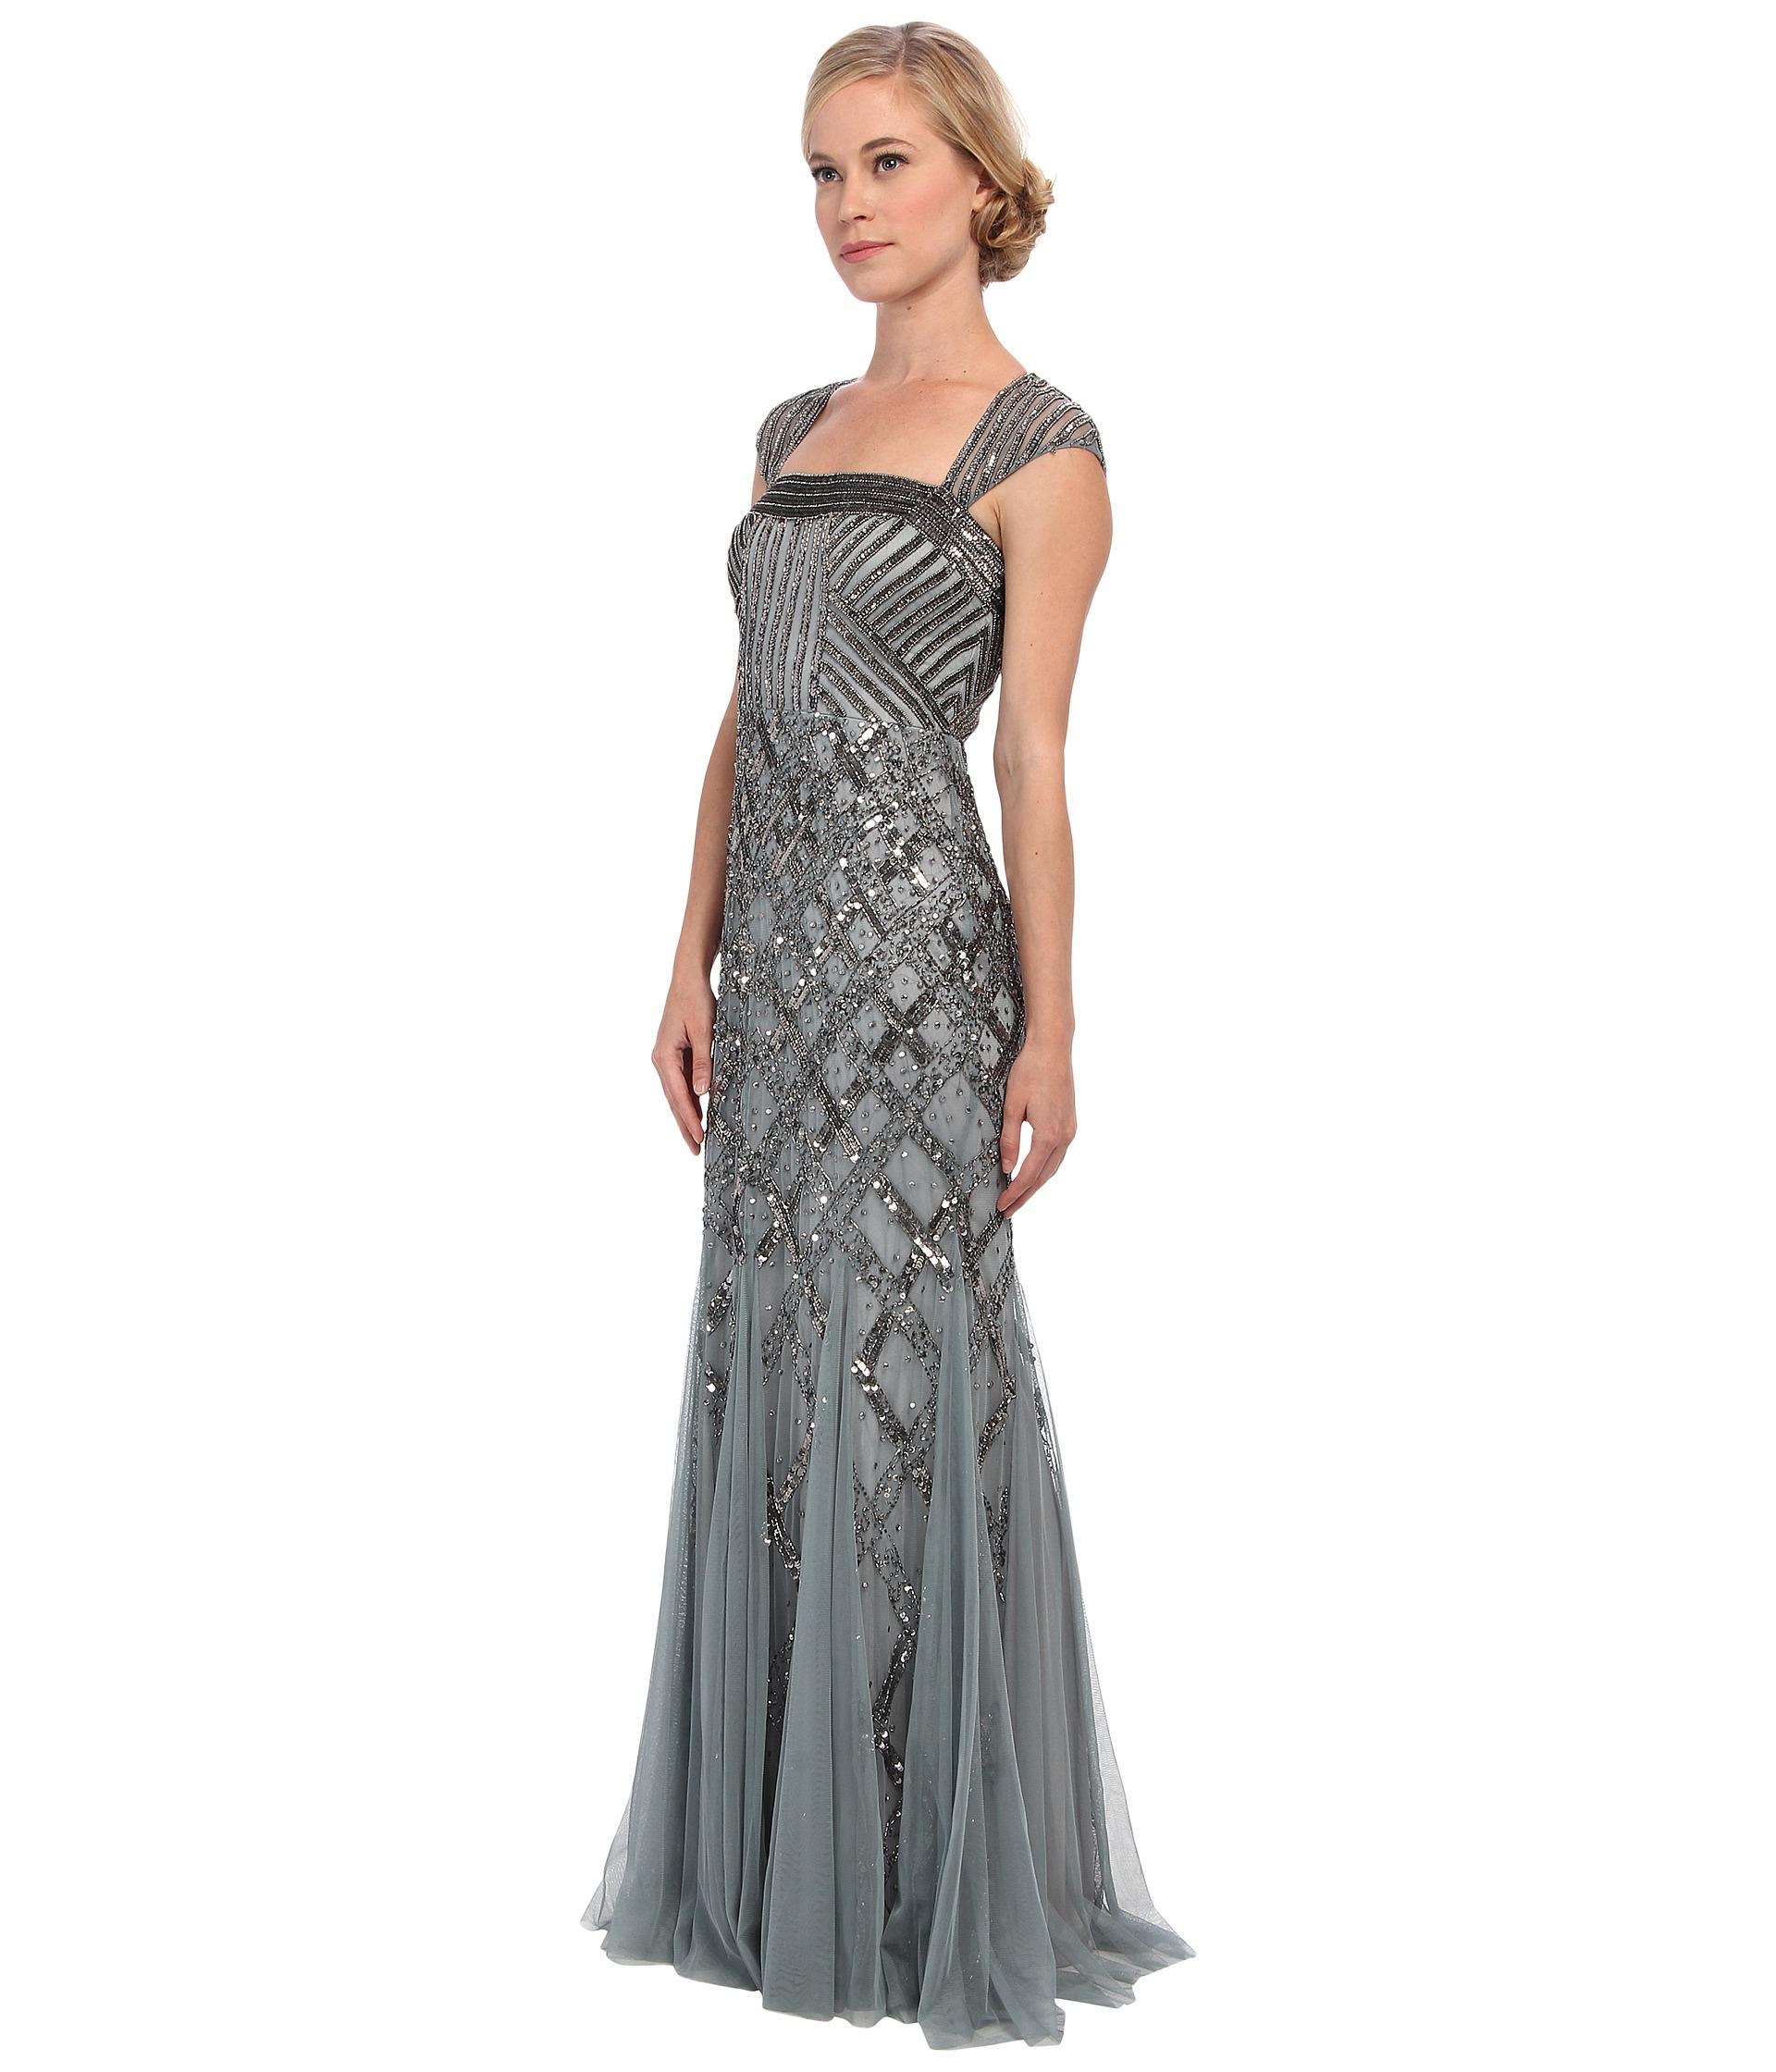 Lyst - Adrianna Papell Petite Cap Sleeve Beaded Dress in Gray